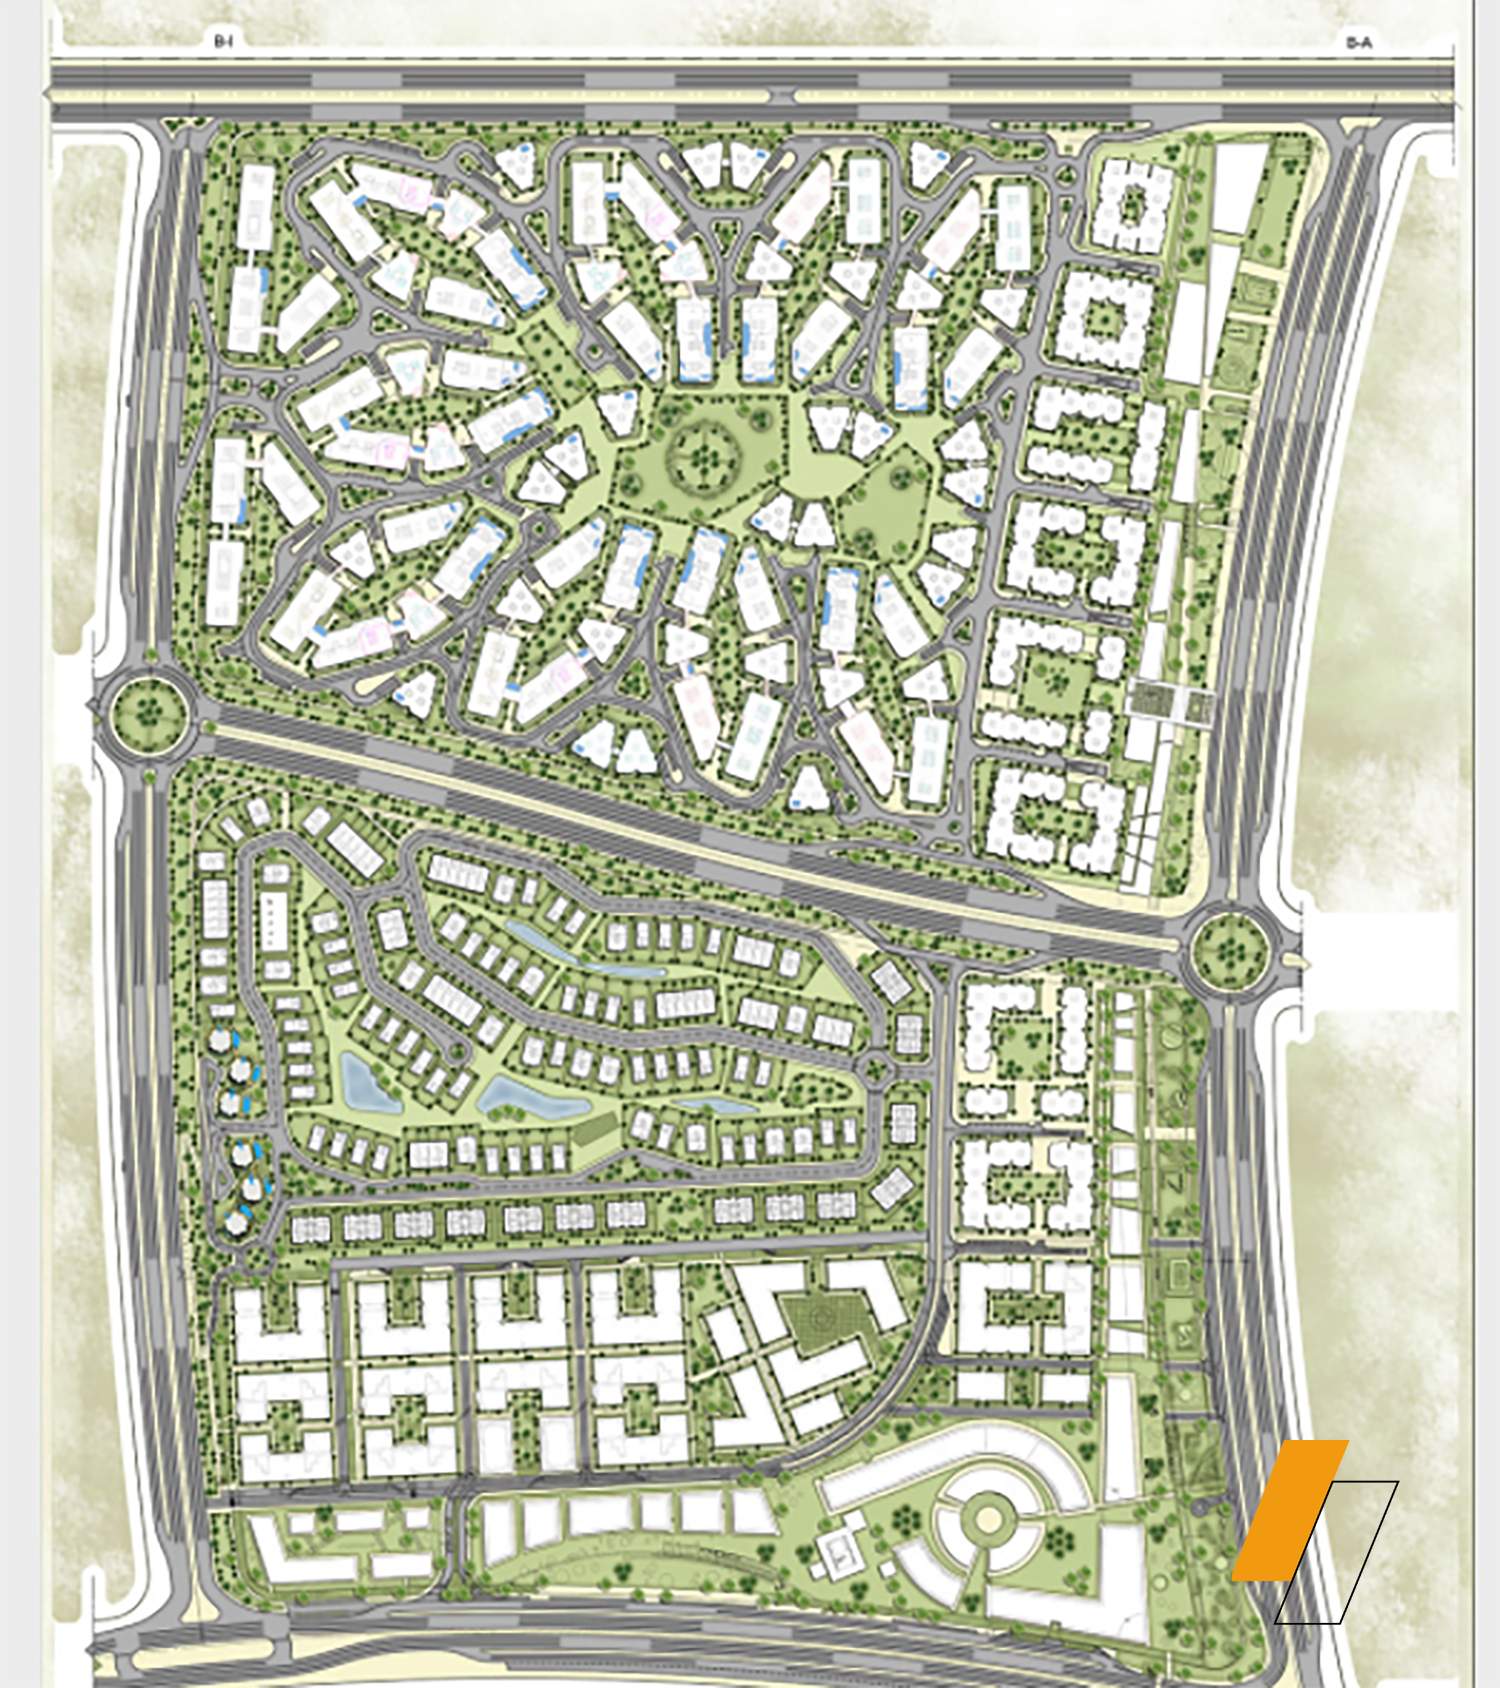 Bloomfields - Master plan image - Flash property                                                style=